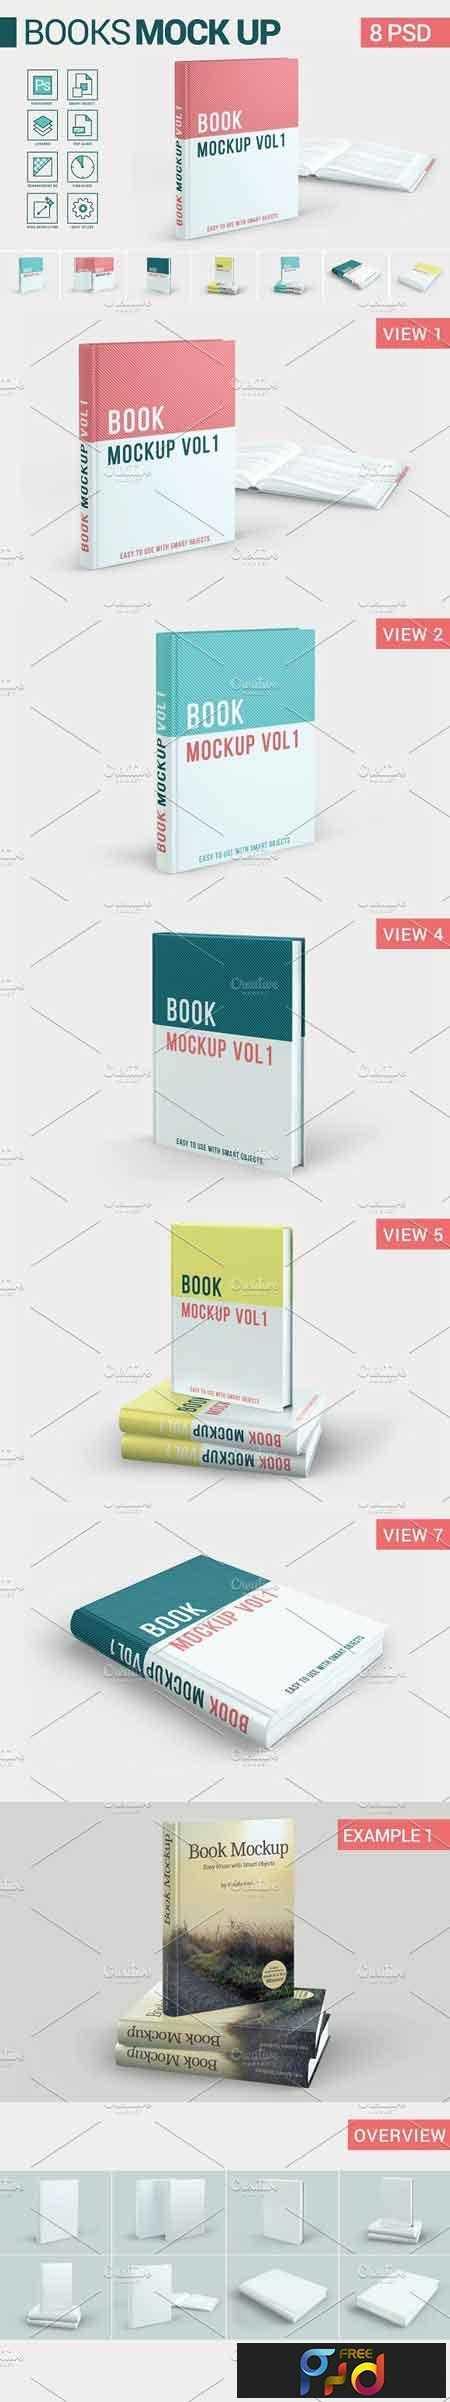 Books Mockup 2767712 1